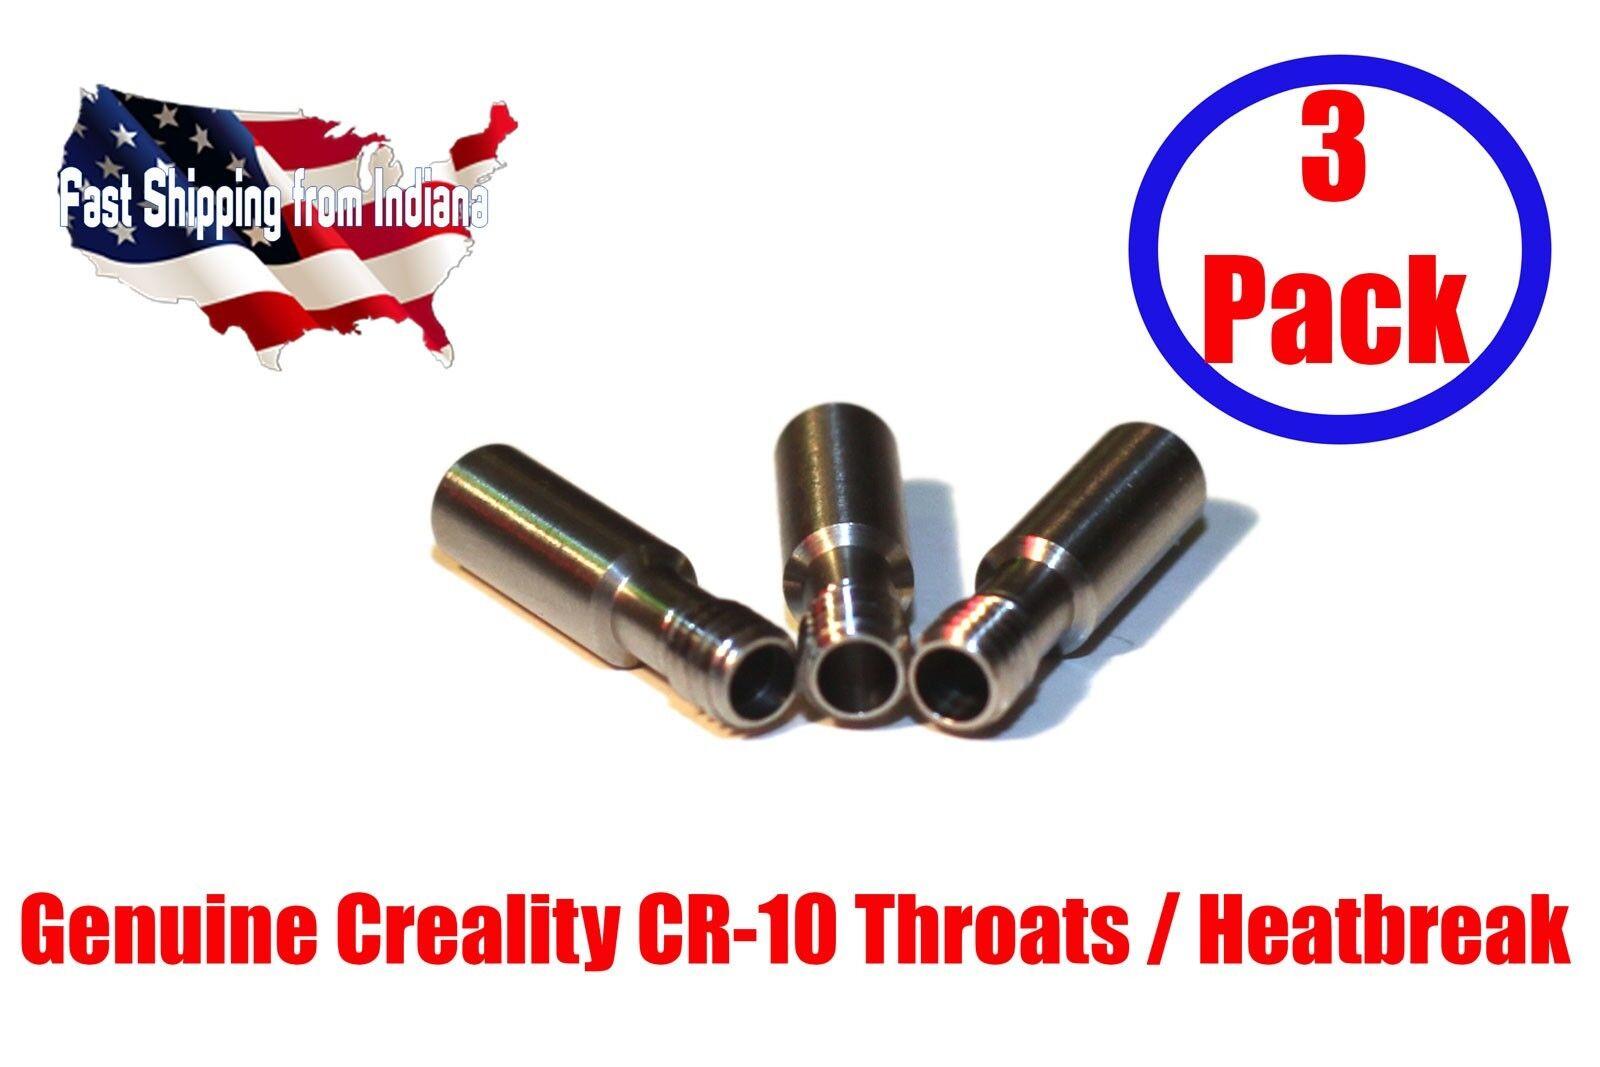 Creality CR-10 Stainless Steel Throat MK8 Genuine Creality, S4, S5, Ender, Mini